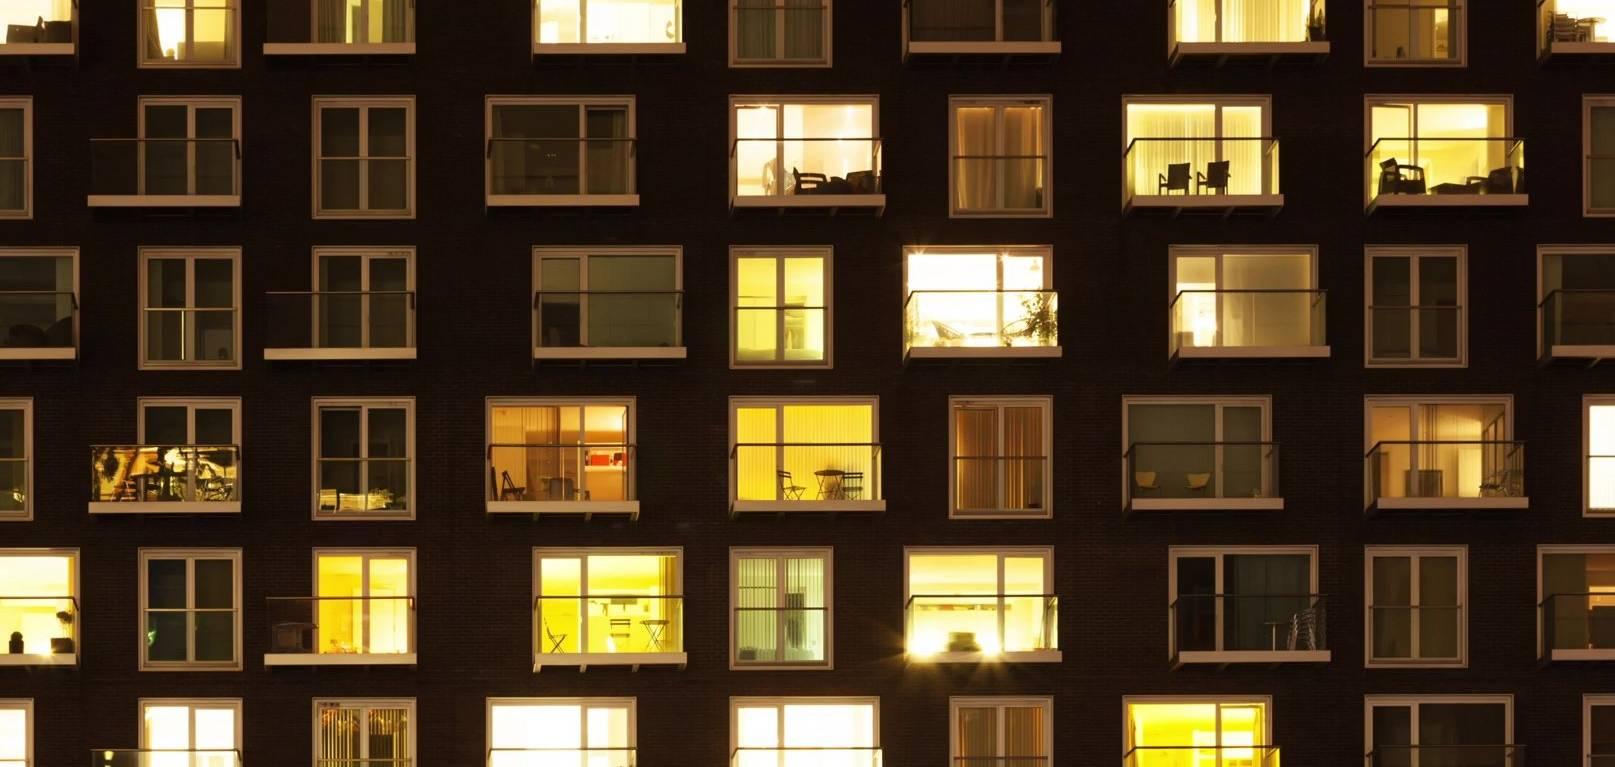 Rambert: Rooms